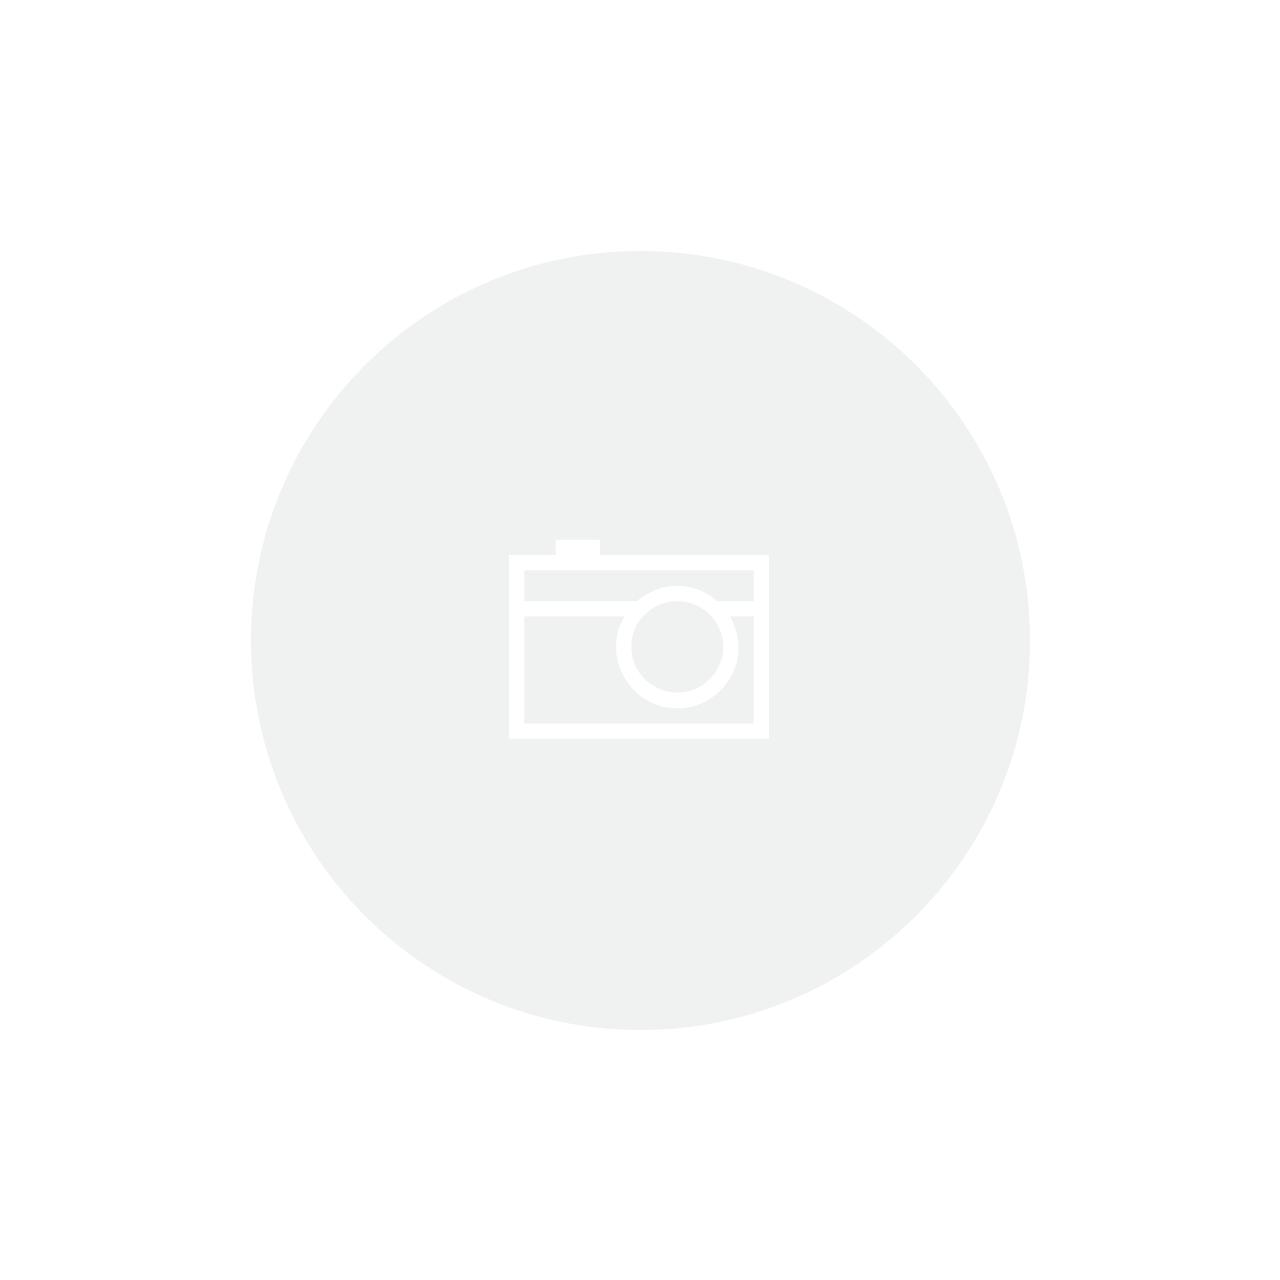 92d70df35 Kit Espumante Tevere Moscatel - 6 unidades